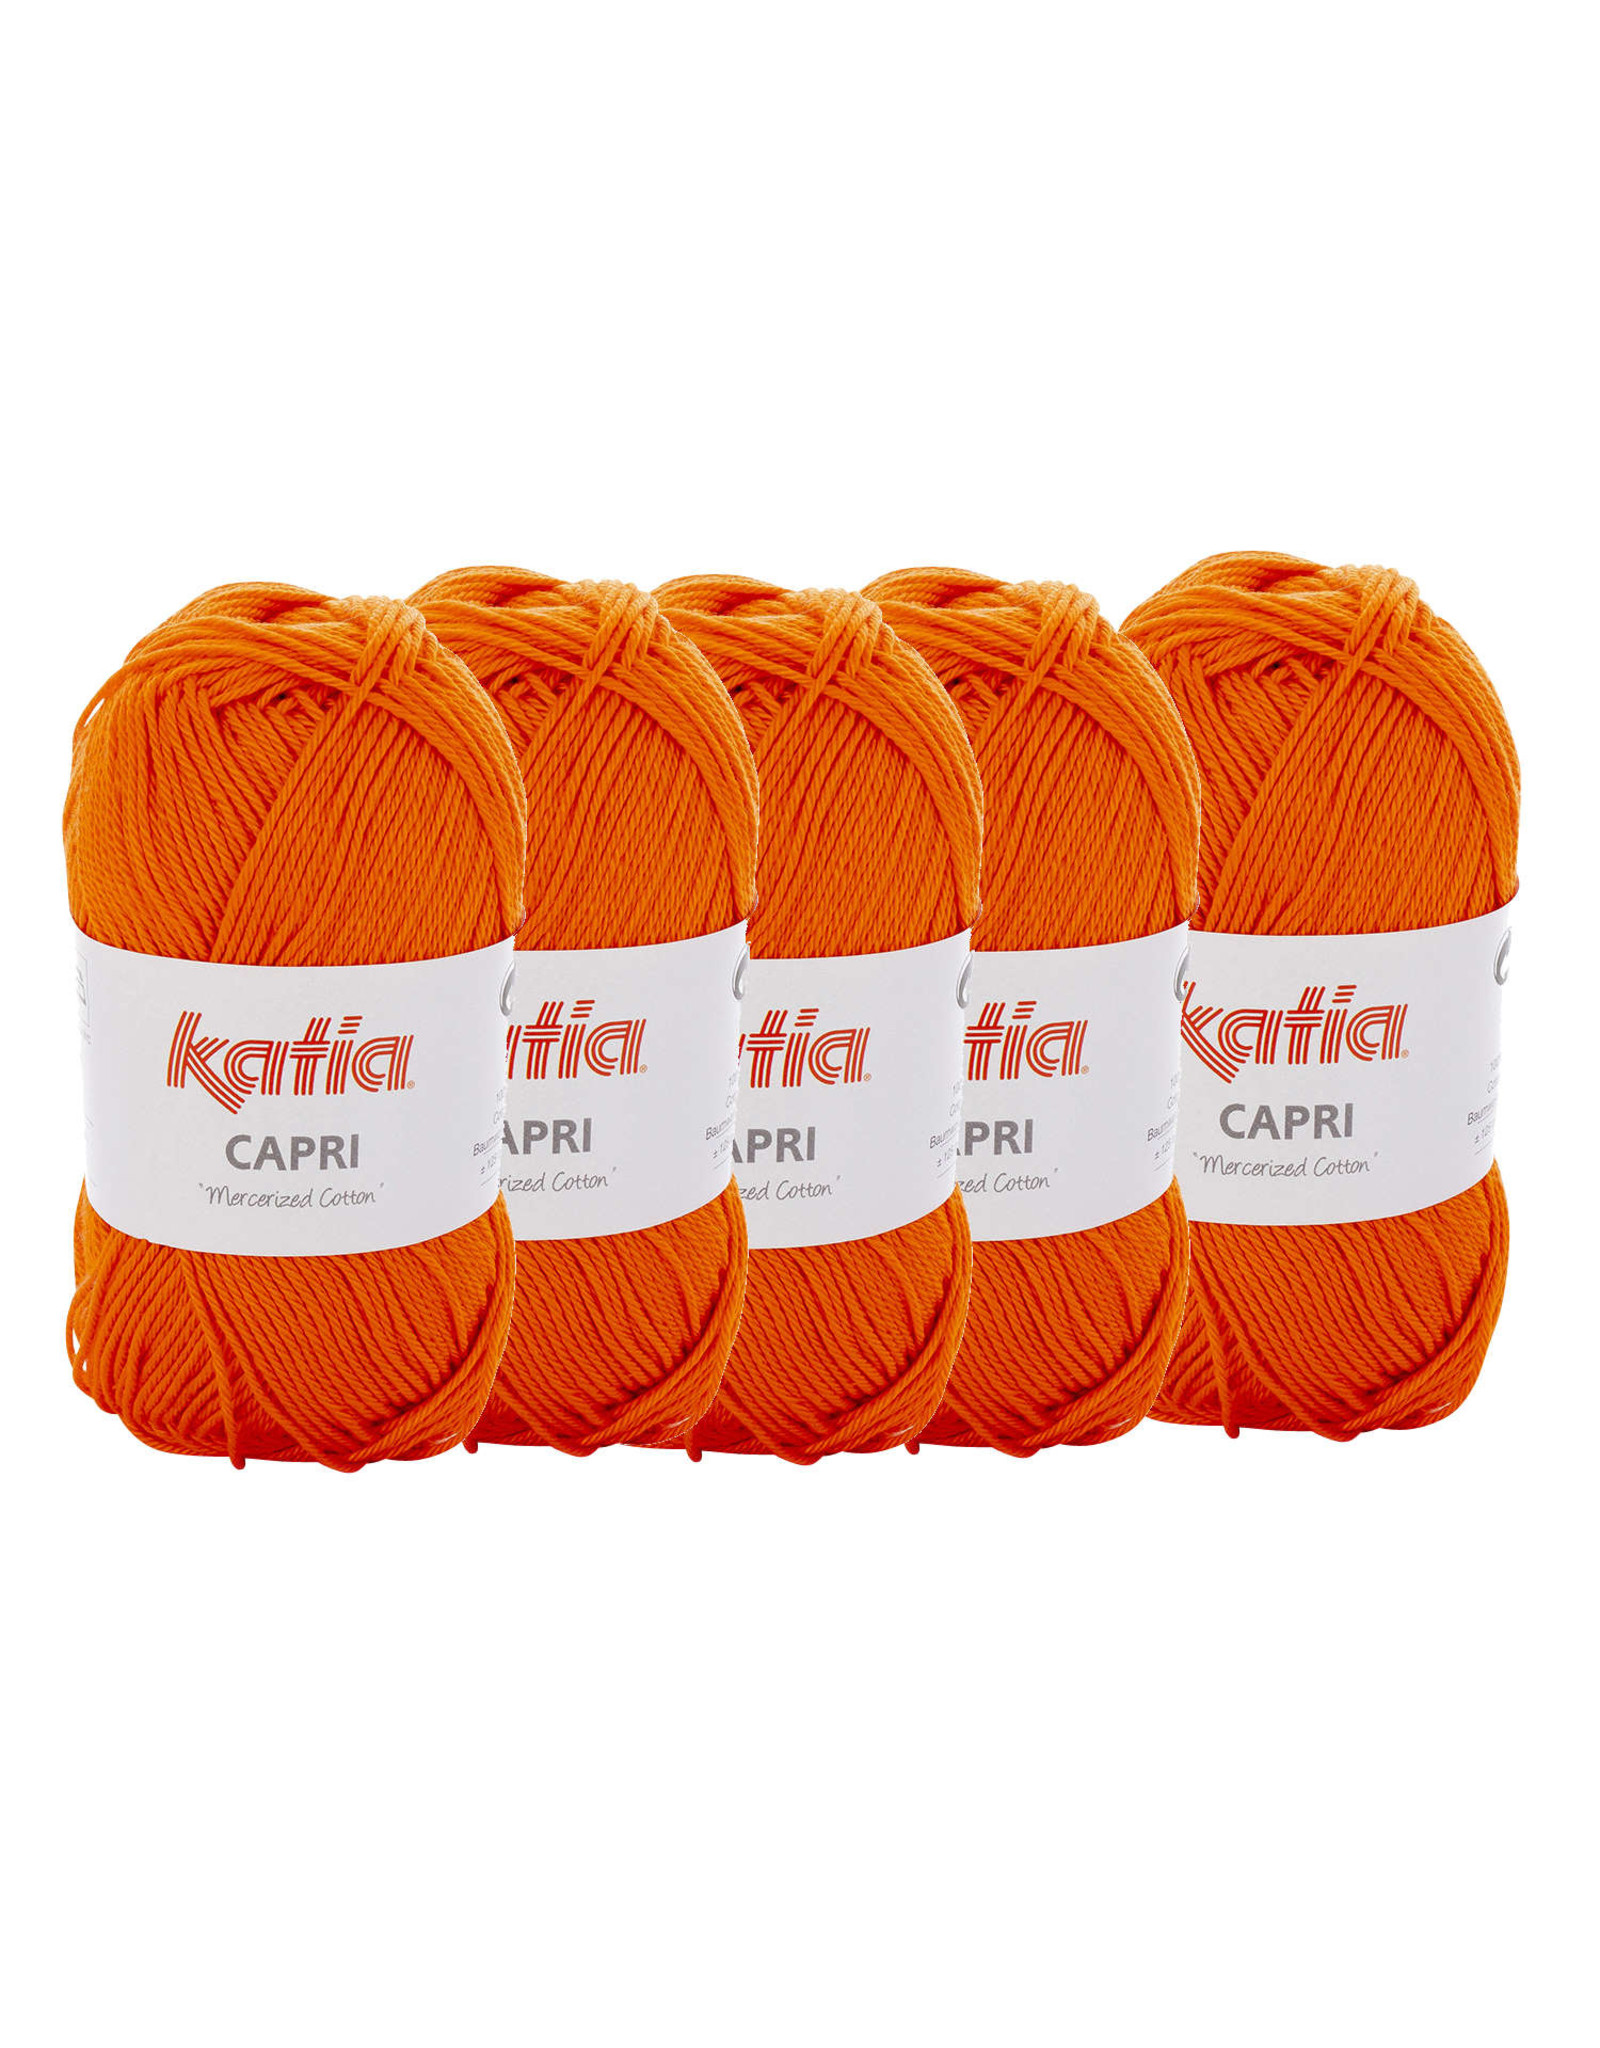 Katia Katia Capri - kleur 143 Dieporanje - bundel 5 x 50 gr. / 125 m. - 100% katoen